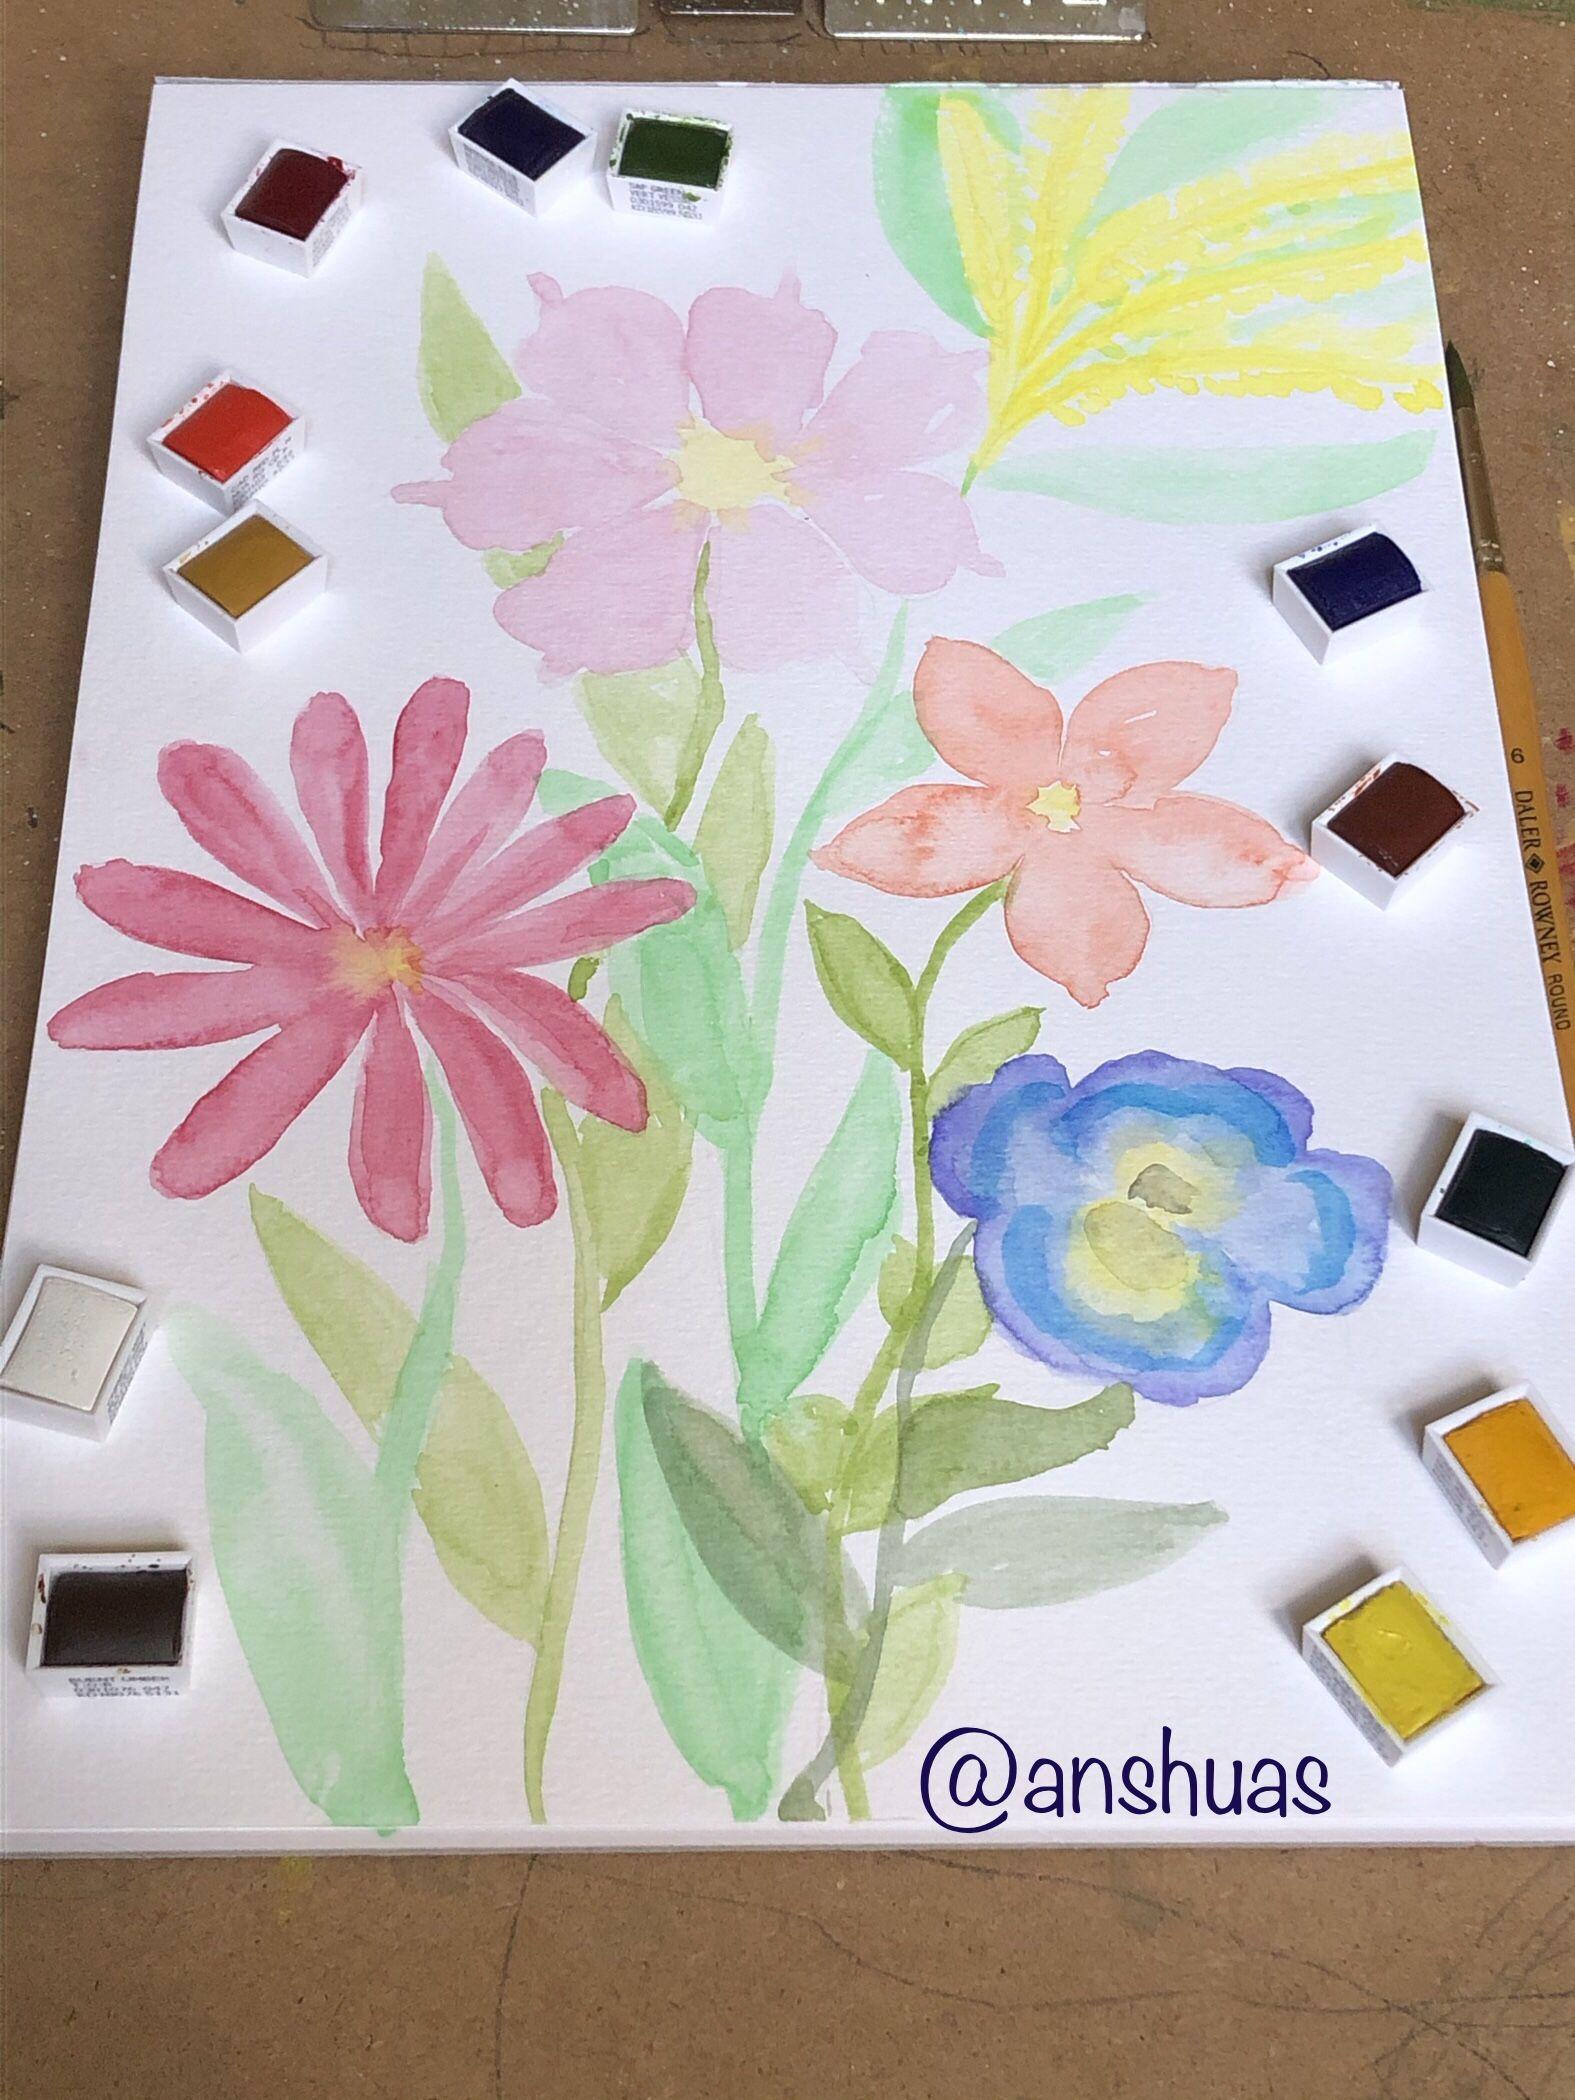 #Imagination #ArtTherapy #Lovetopaint #Design #Watercolor – World Through Lenses